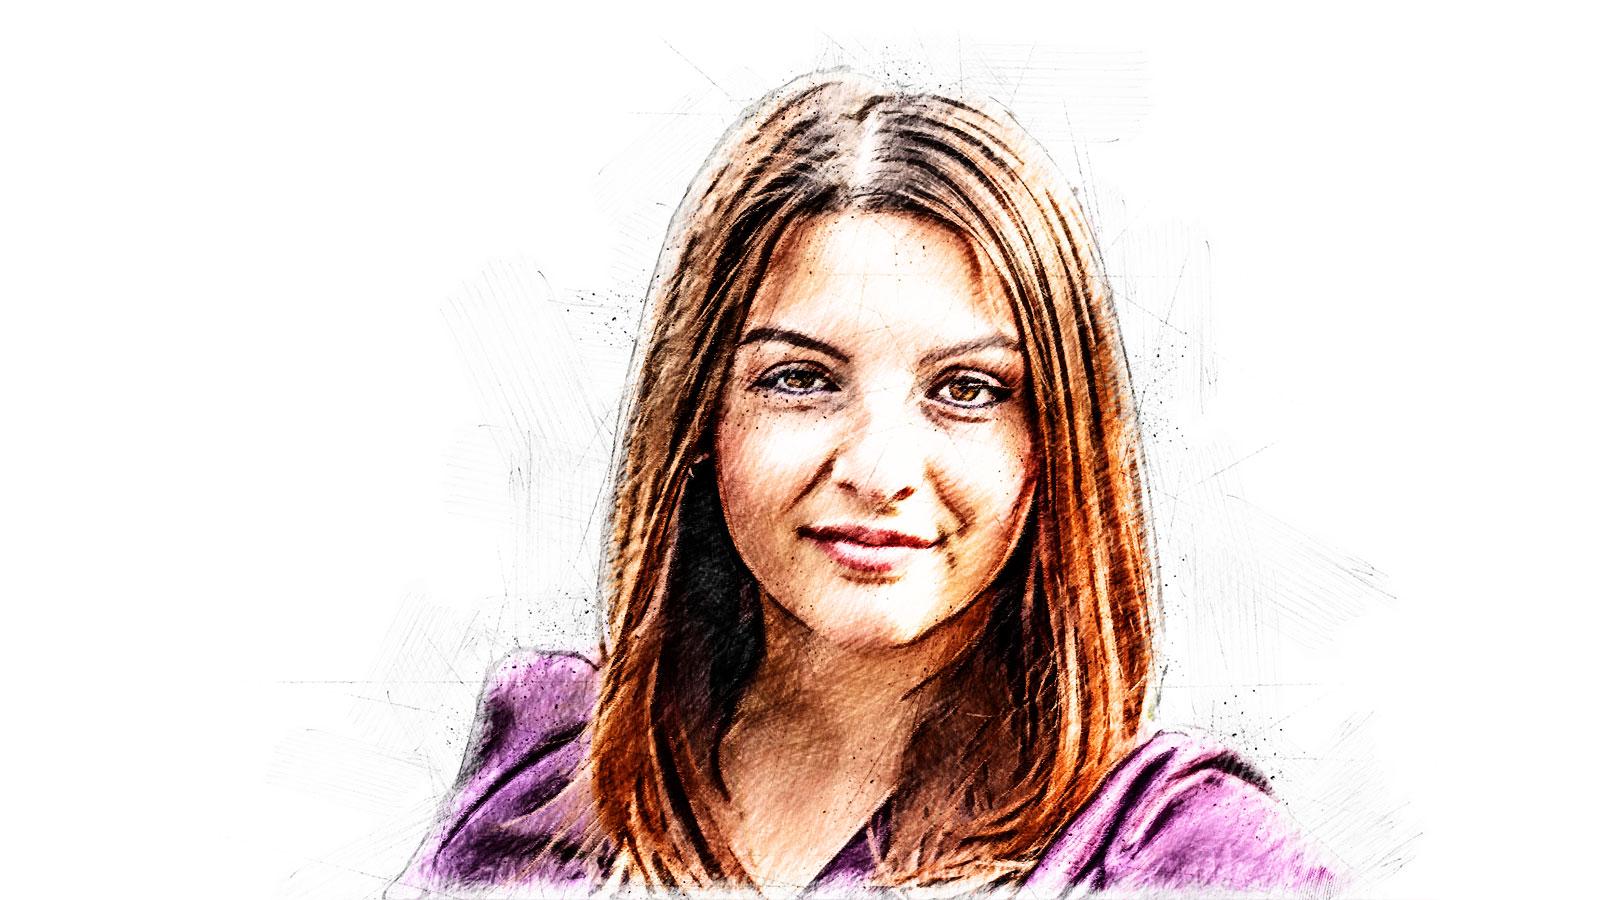 Ana-Maria Trăsnea, SPD, Migranten, Berlin, Rassismus